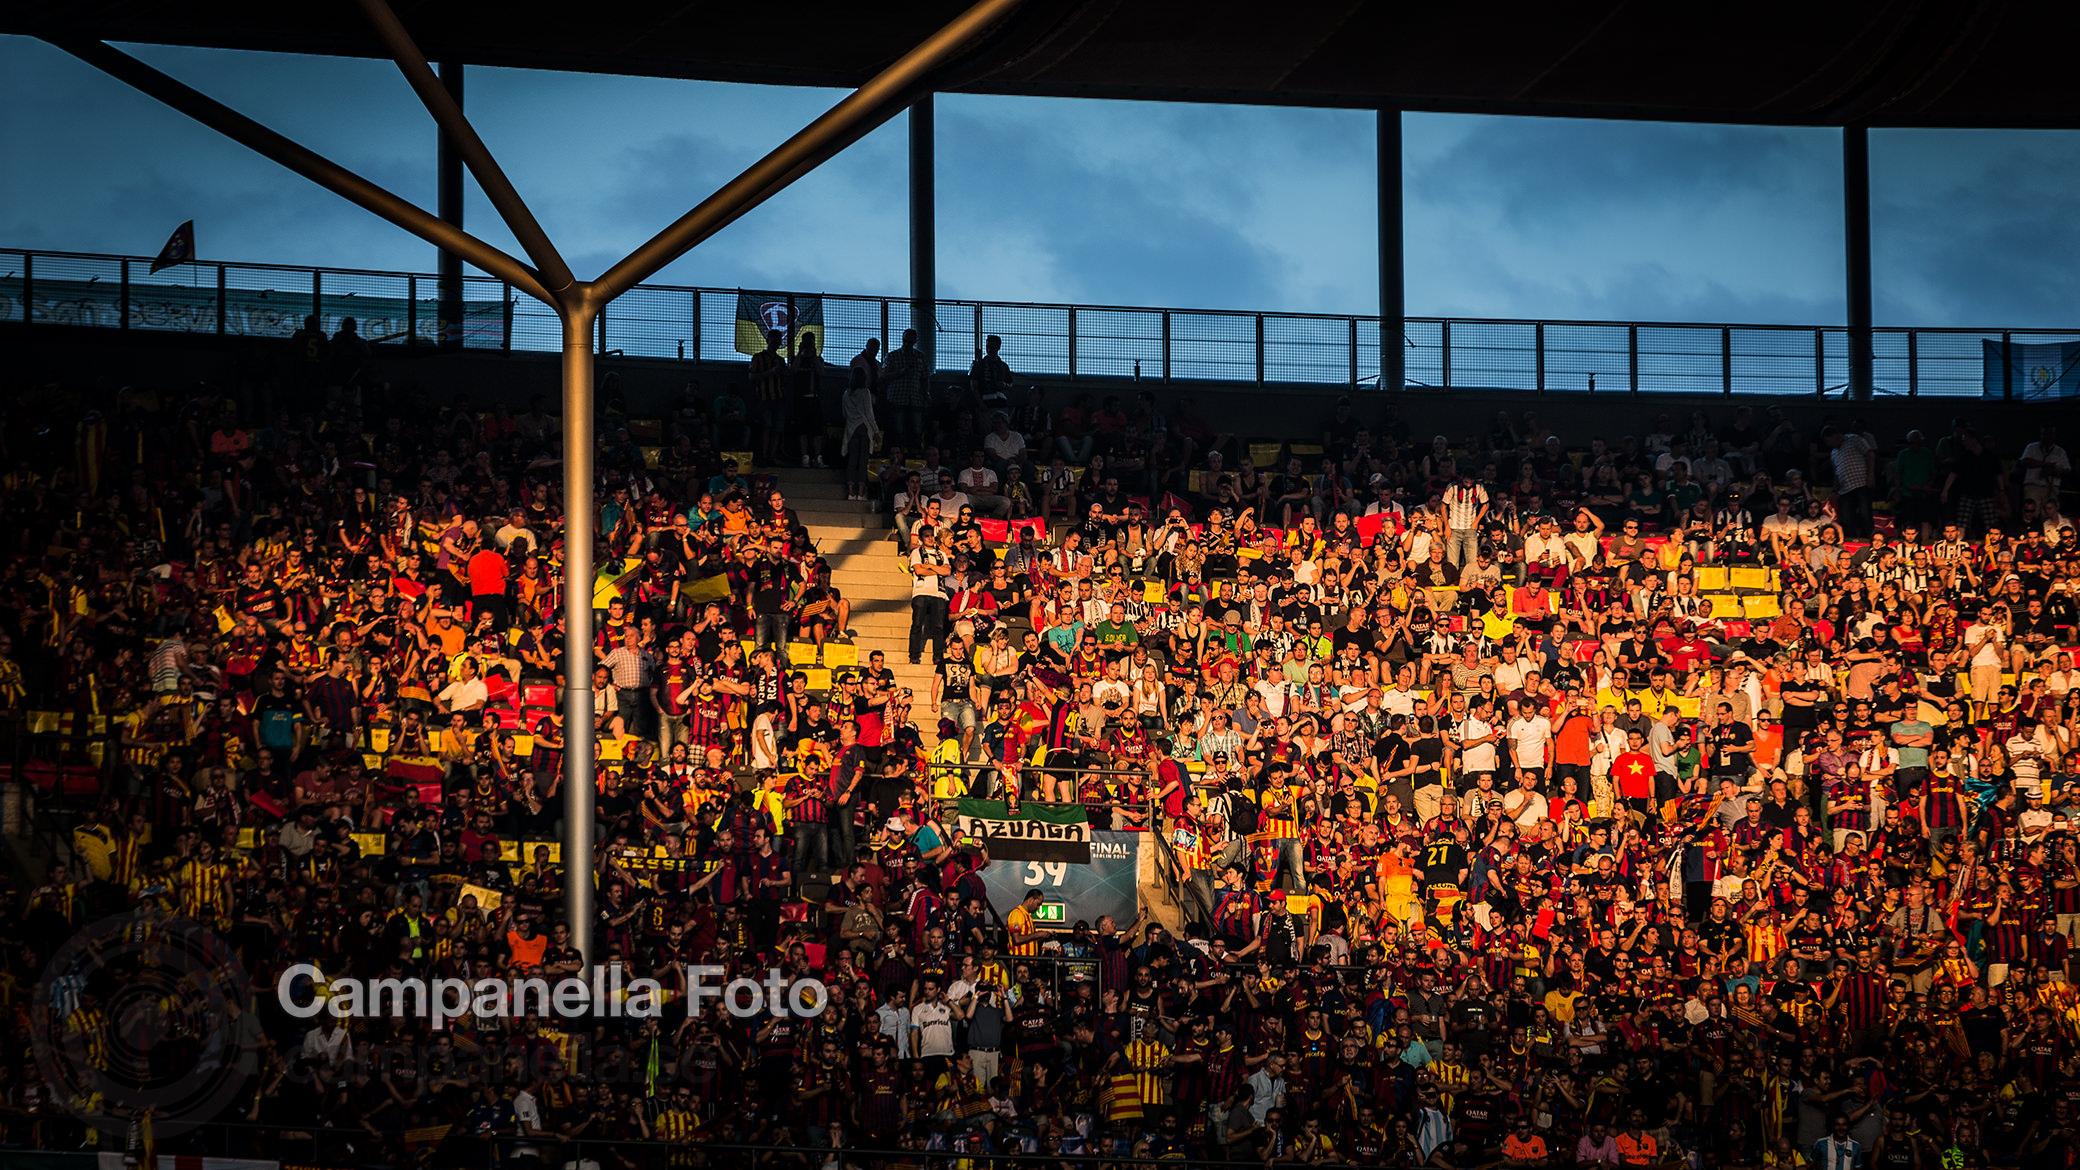 Champions League Final (Part. 1) - Michael Campanella Photography